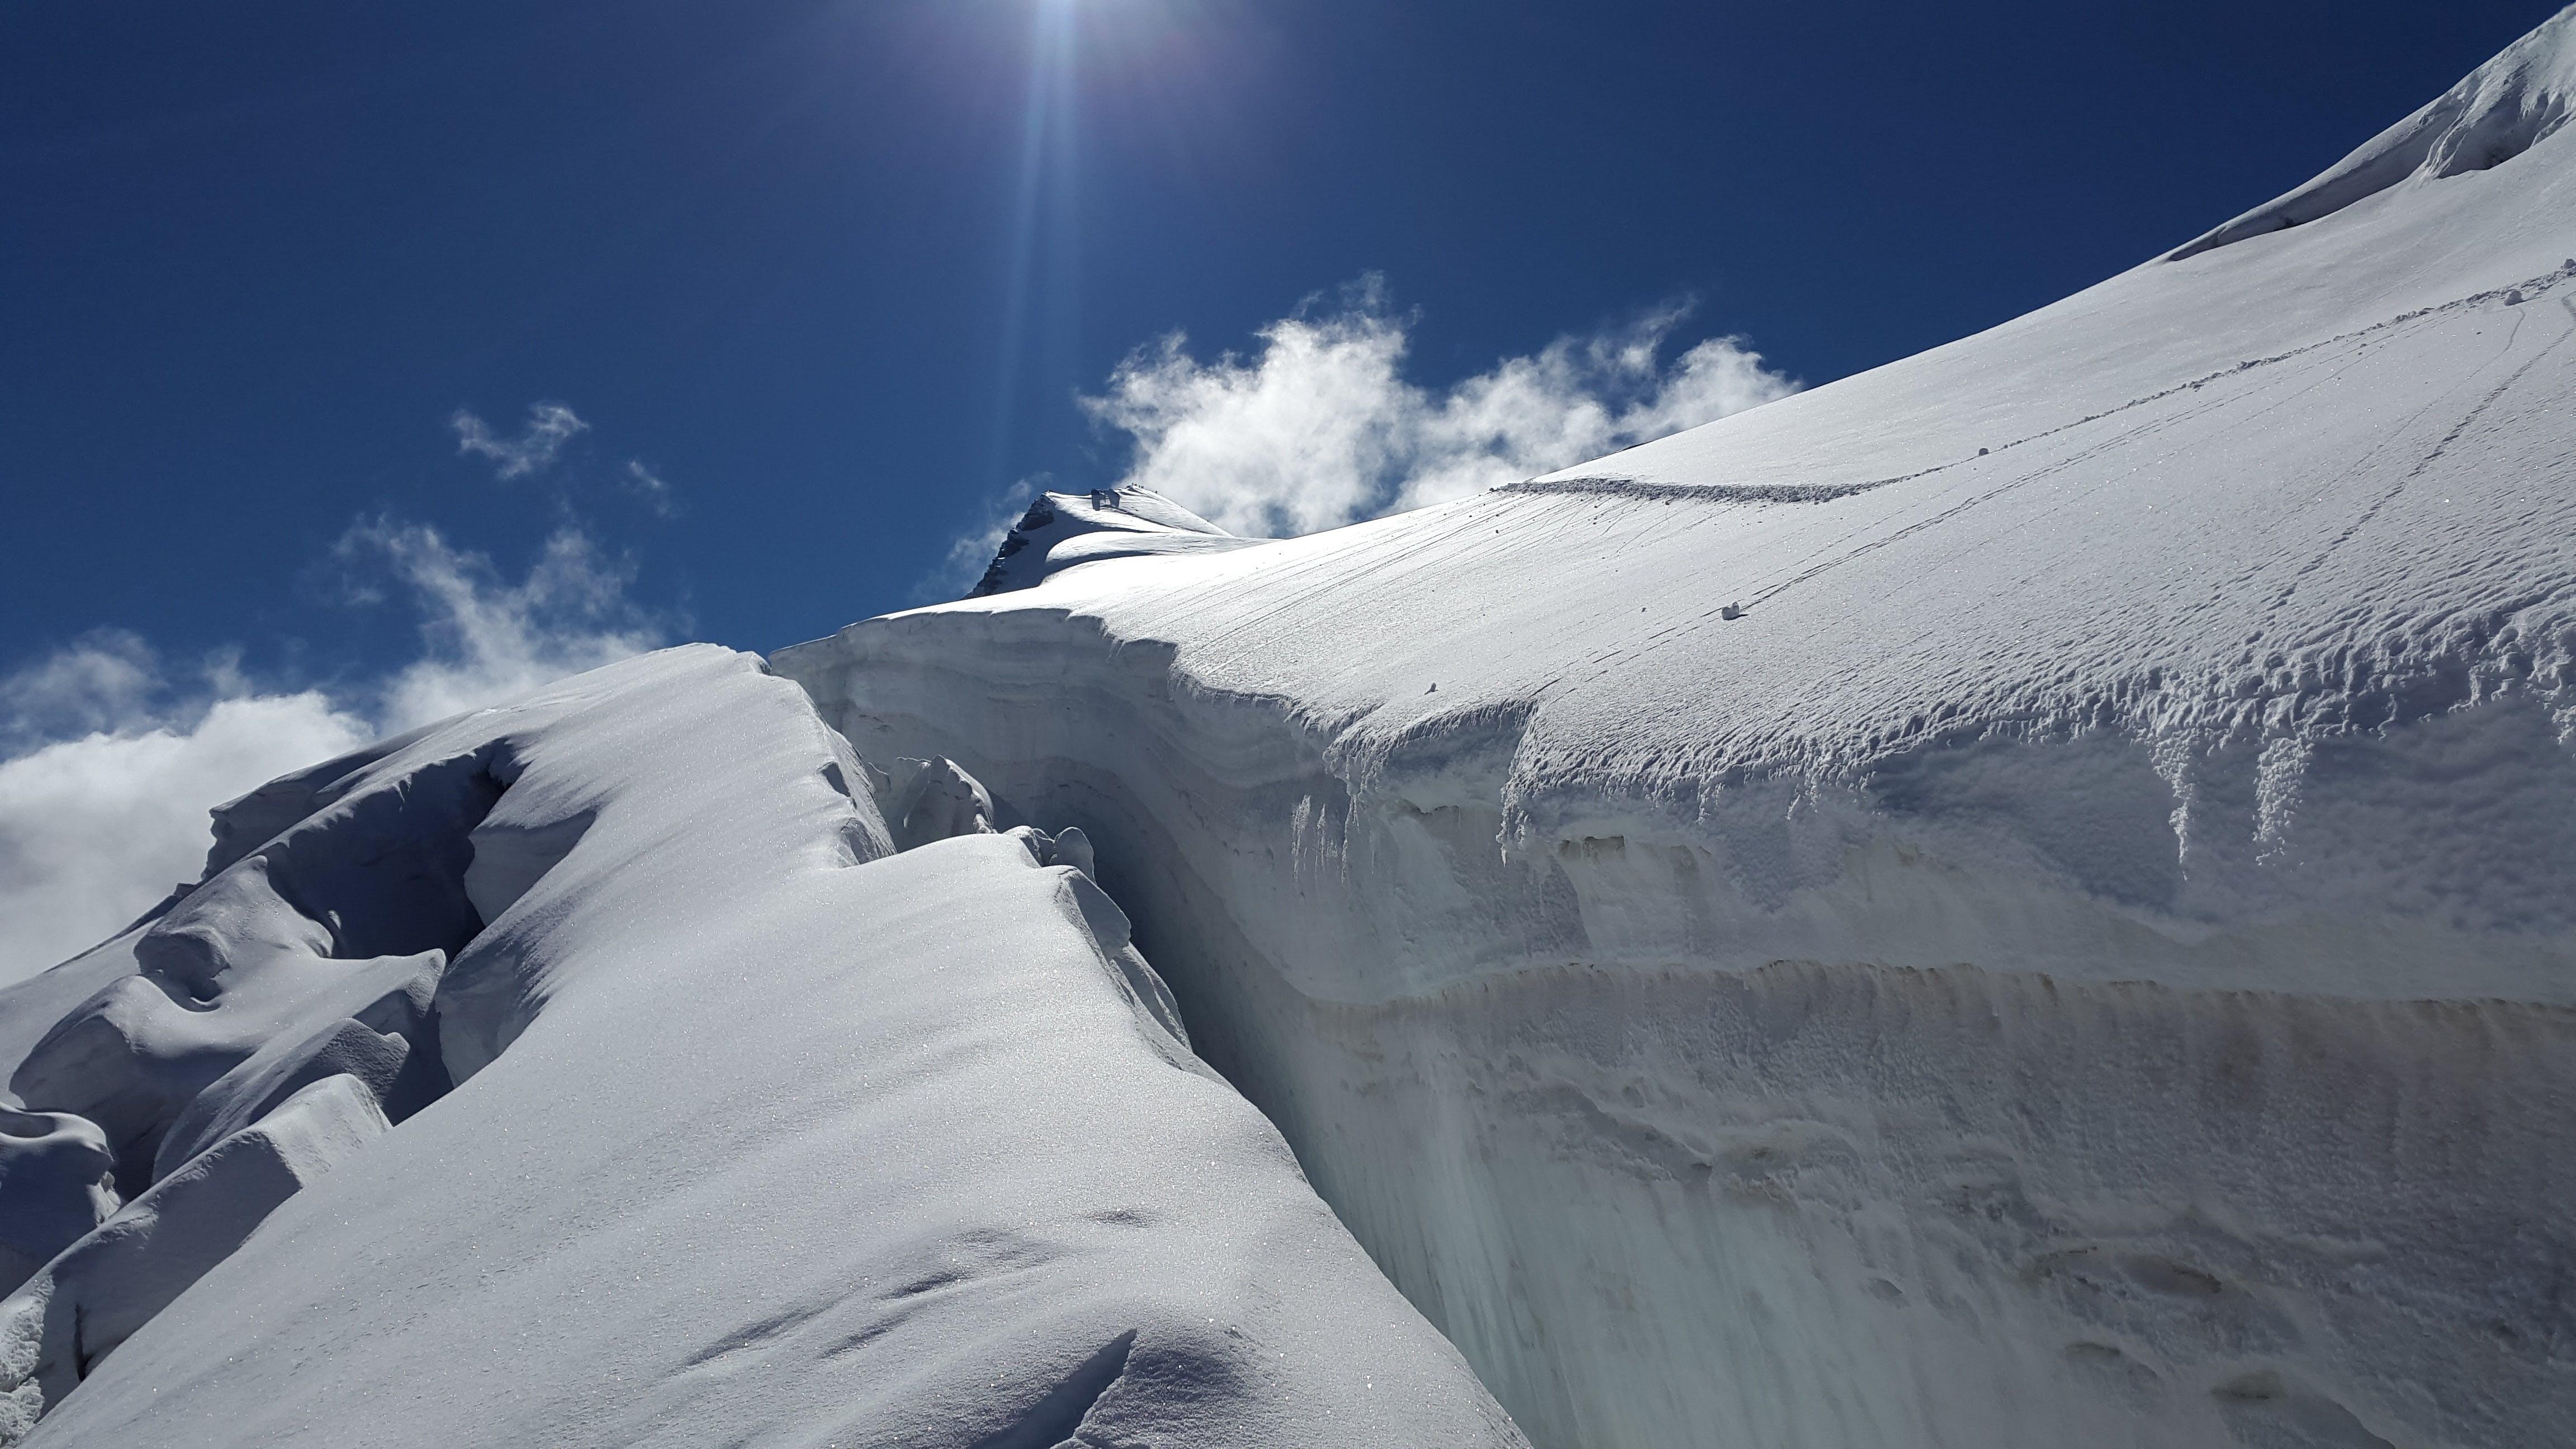 Fotos de stock gratuitas de alpino, alto, ascender, aventura